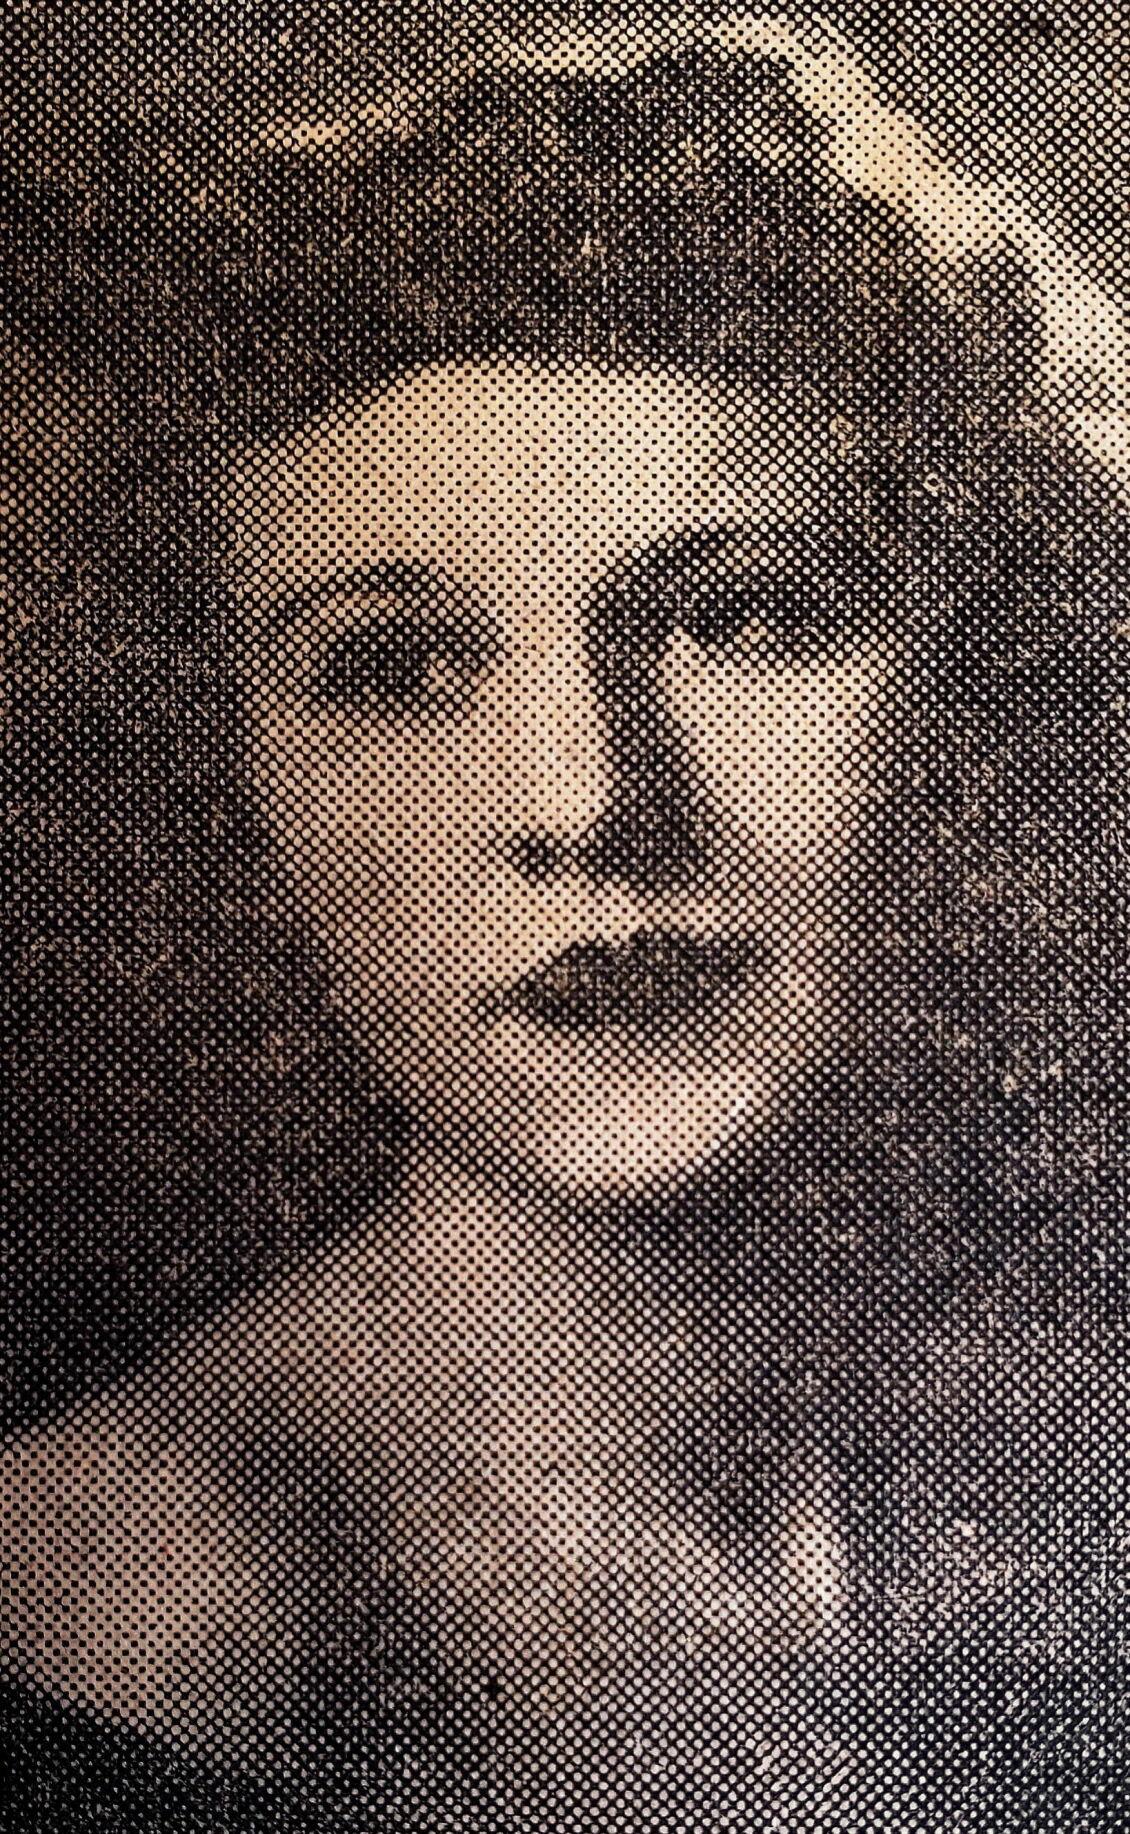 Juanita Rose (Robbins) Ehrke